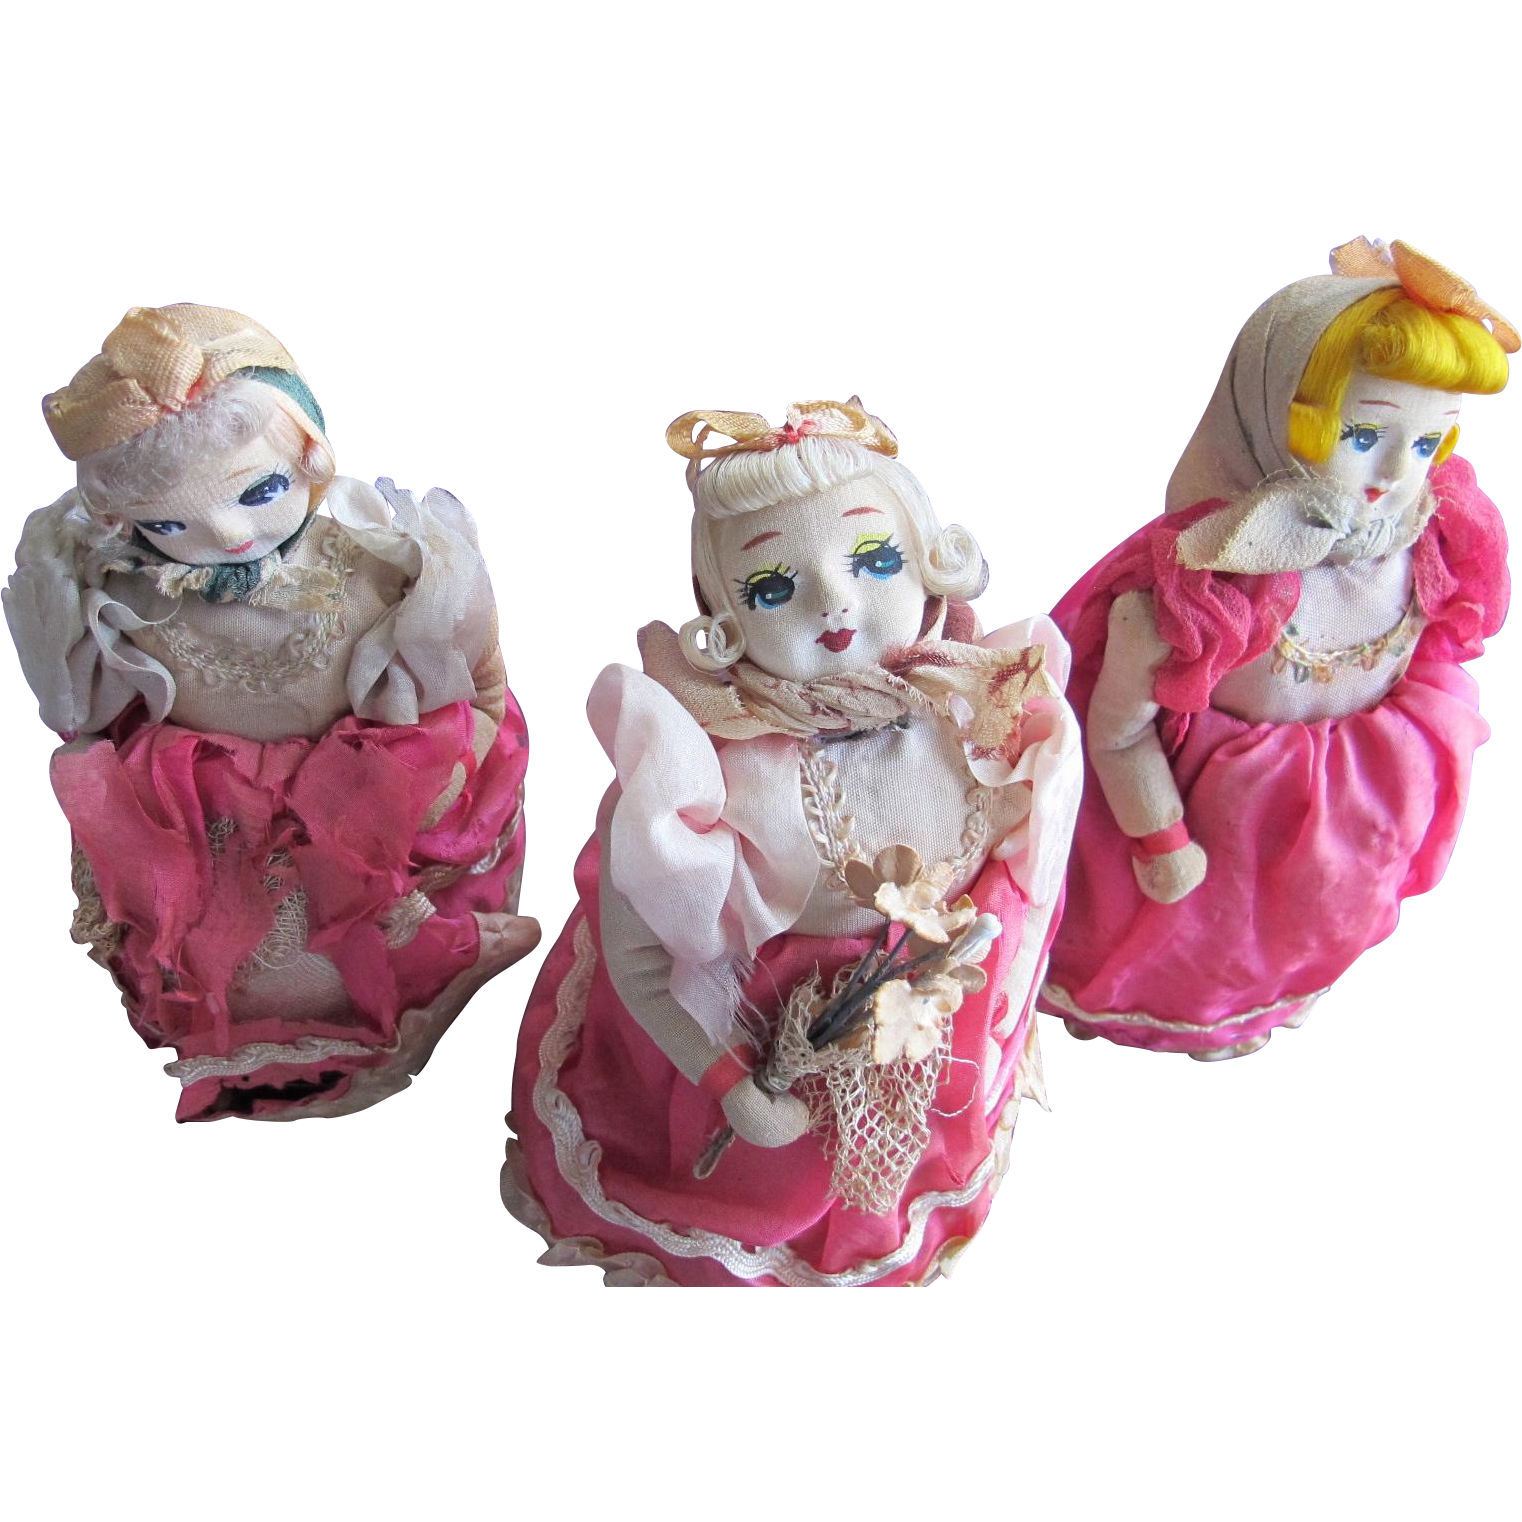 Three Mechanical Dolls Rolls on Wheels Toys Japan